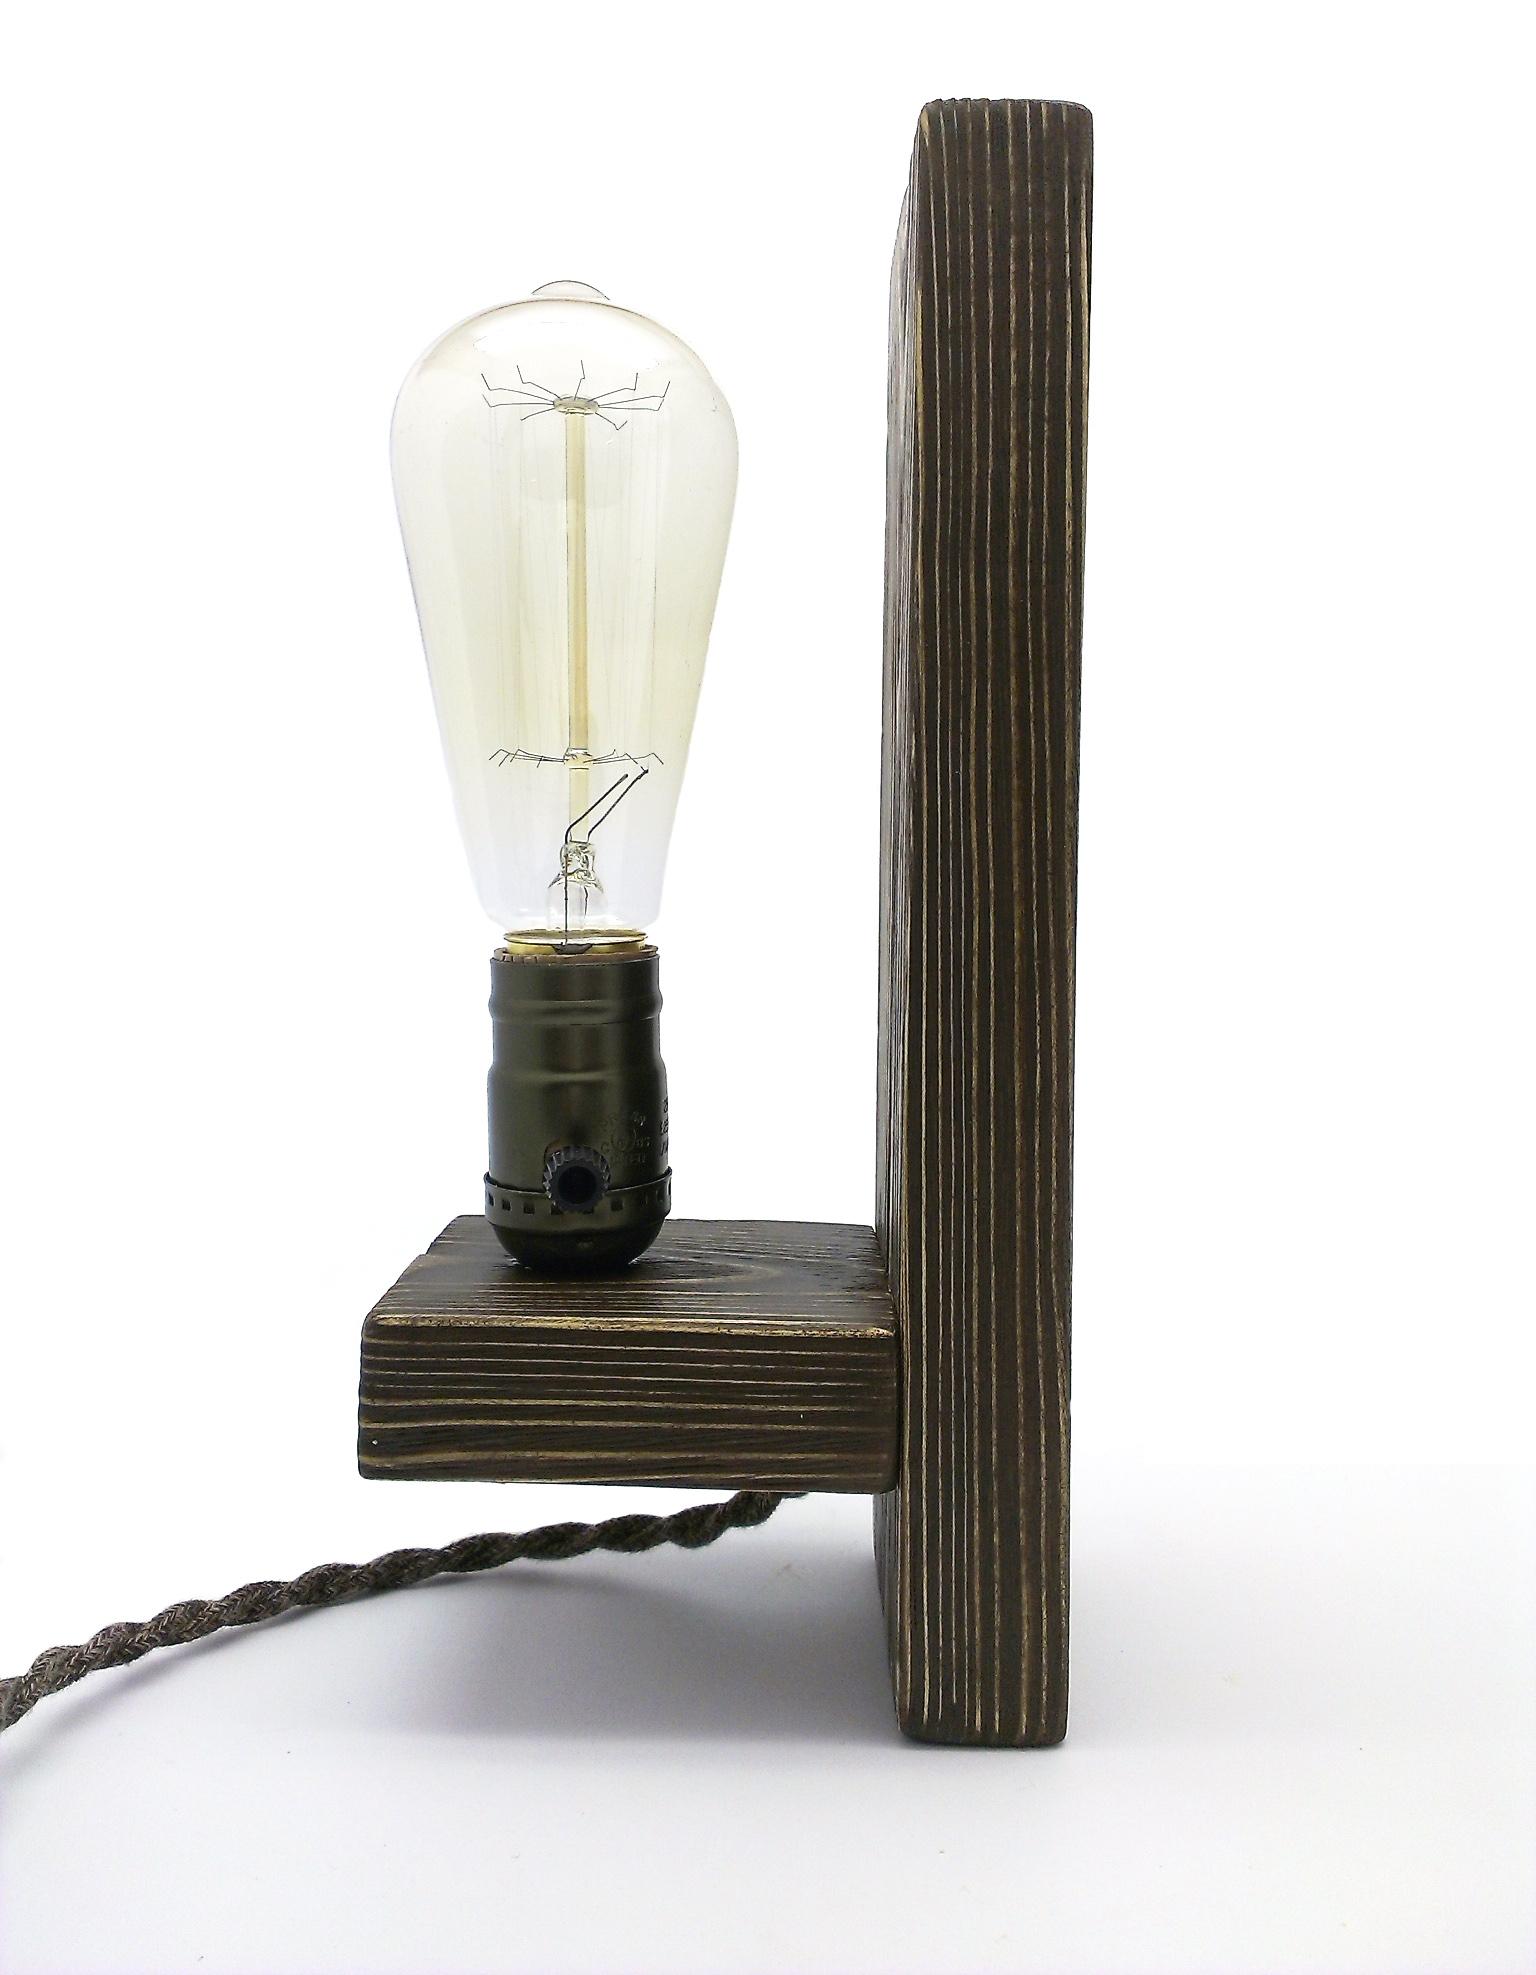 LAMPA KP1 EDISON VINTAGE STENU SCONCE